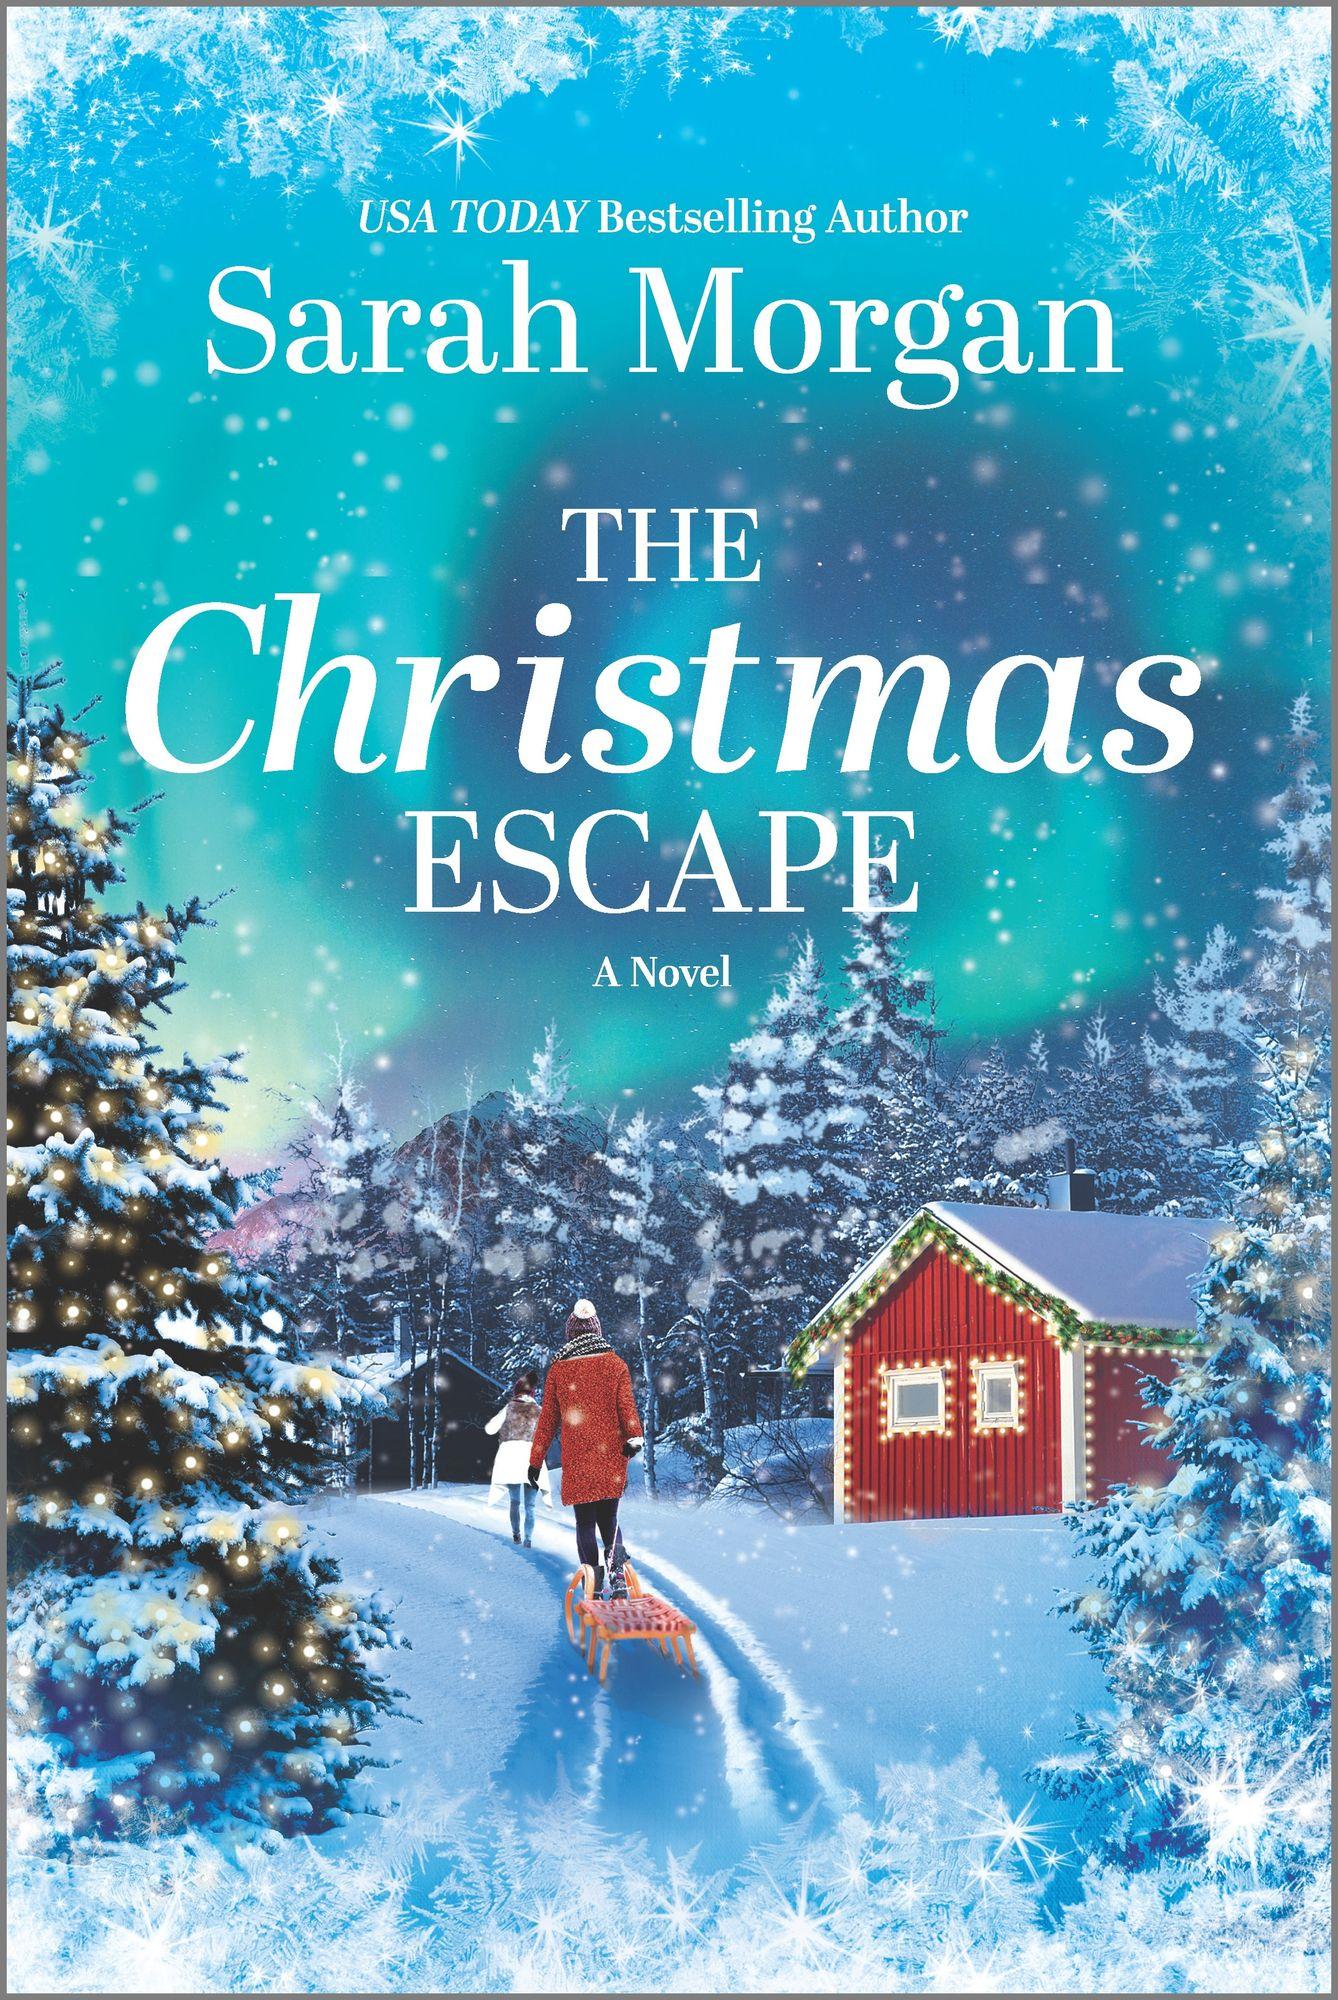 The Christmas Escape by Sarah Morgan